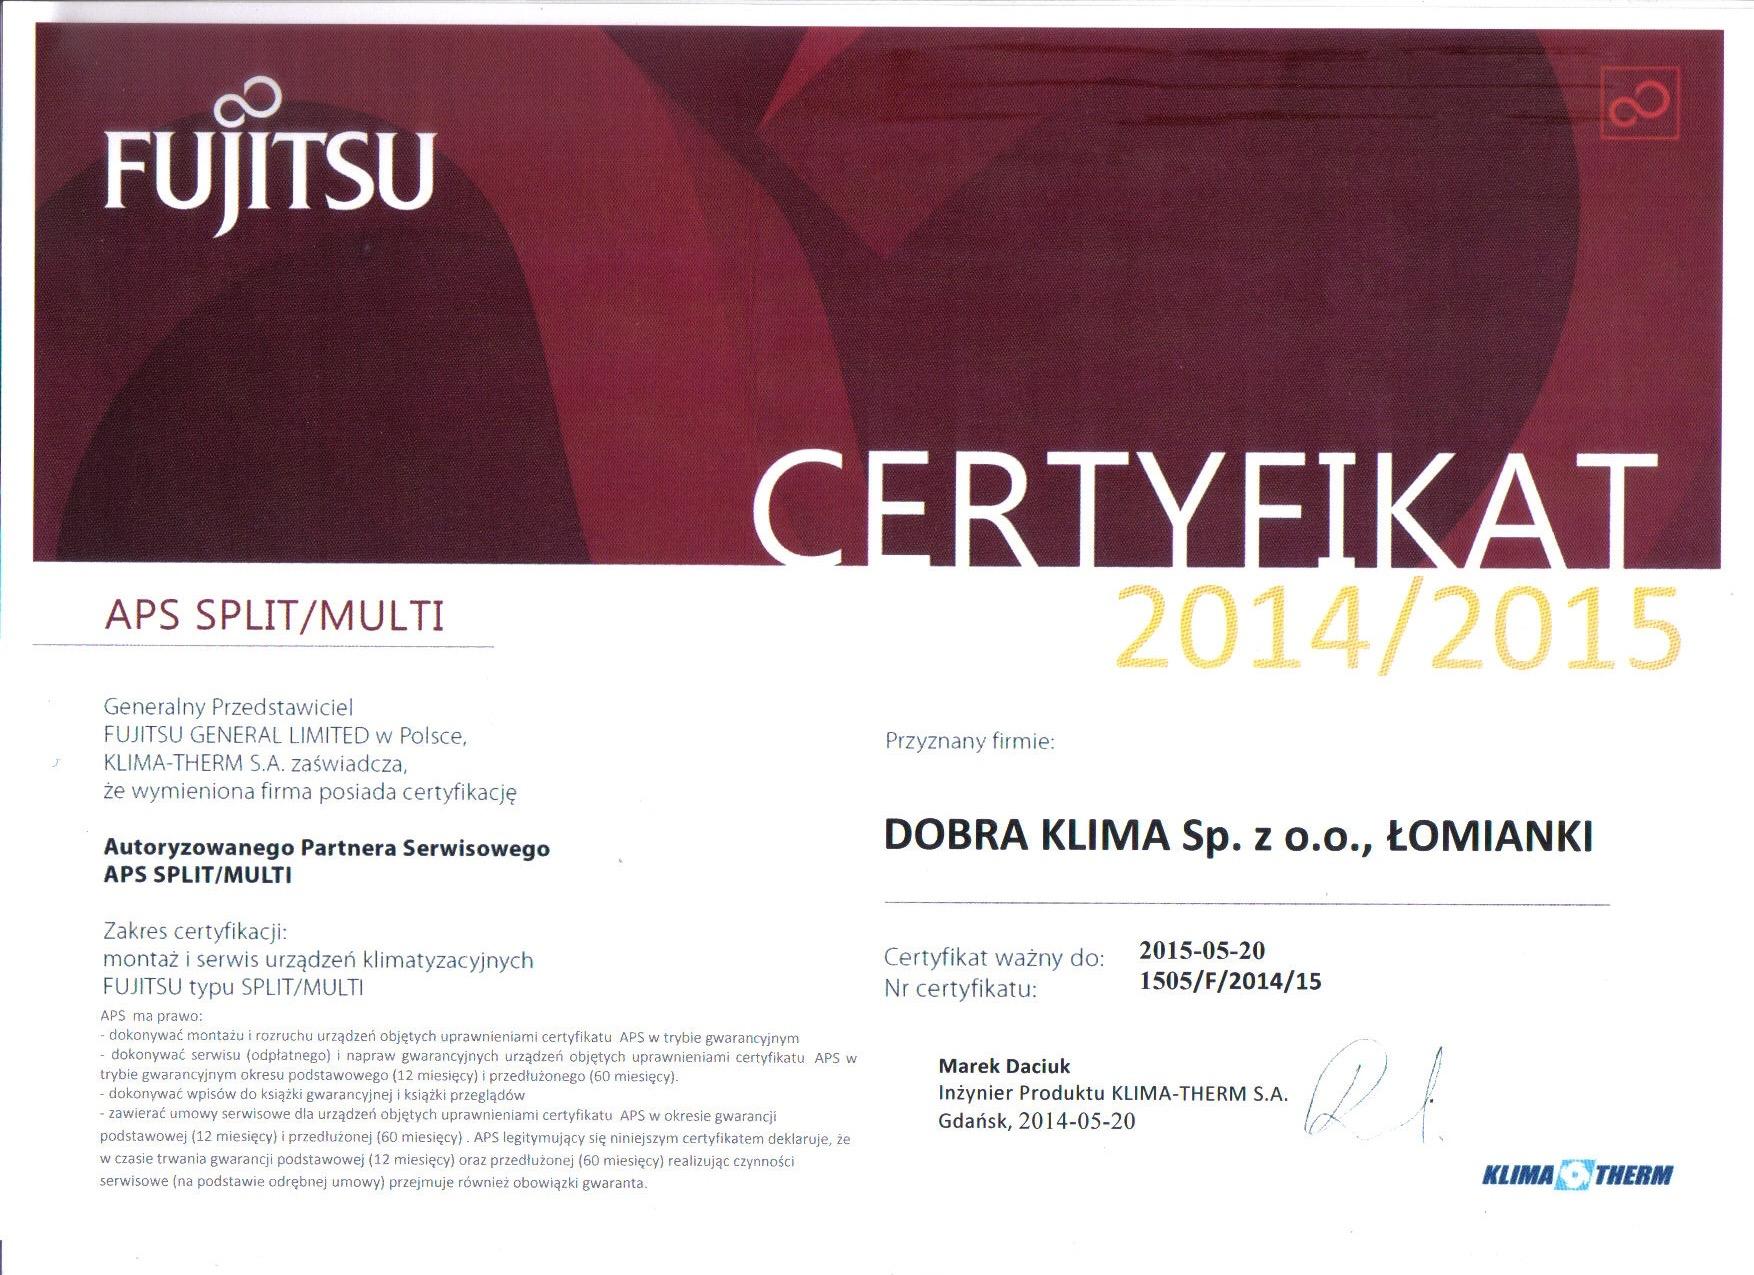 2014-certyfikat-fujitsu